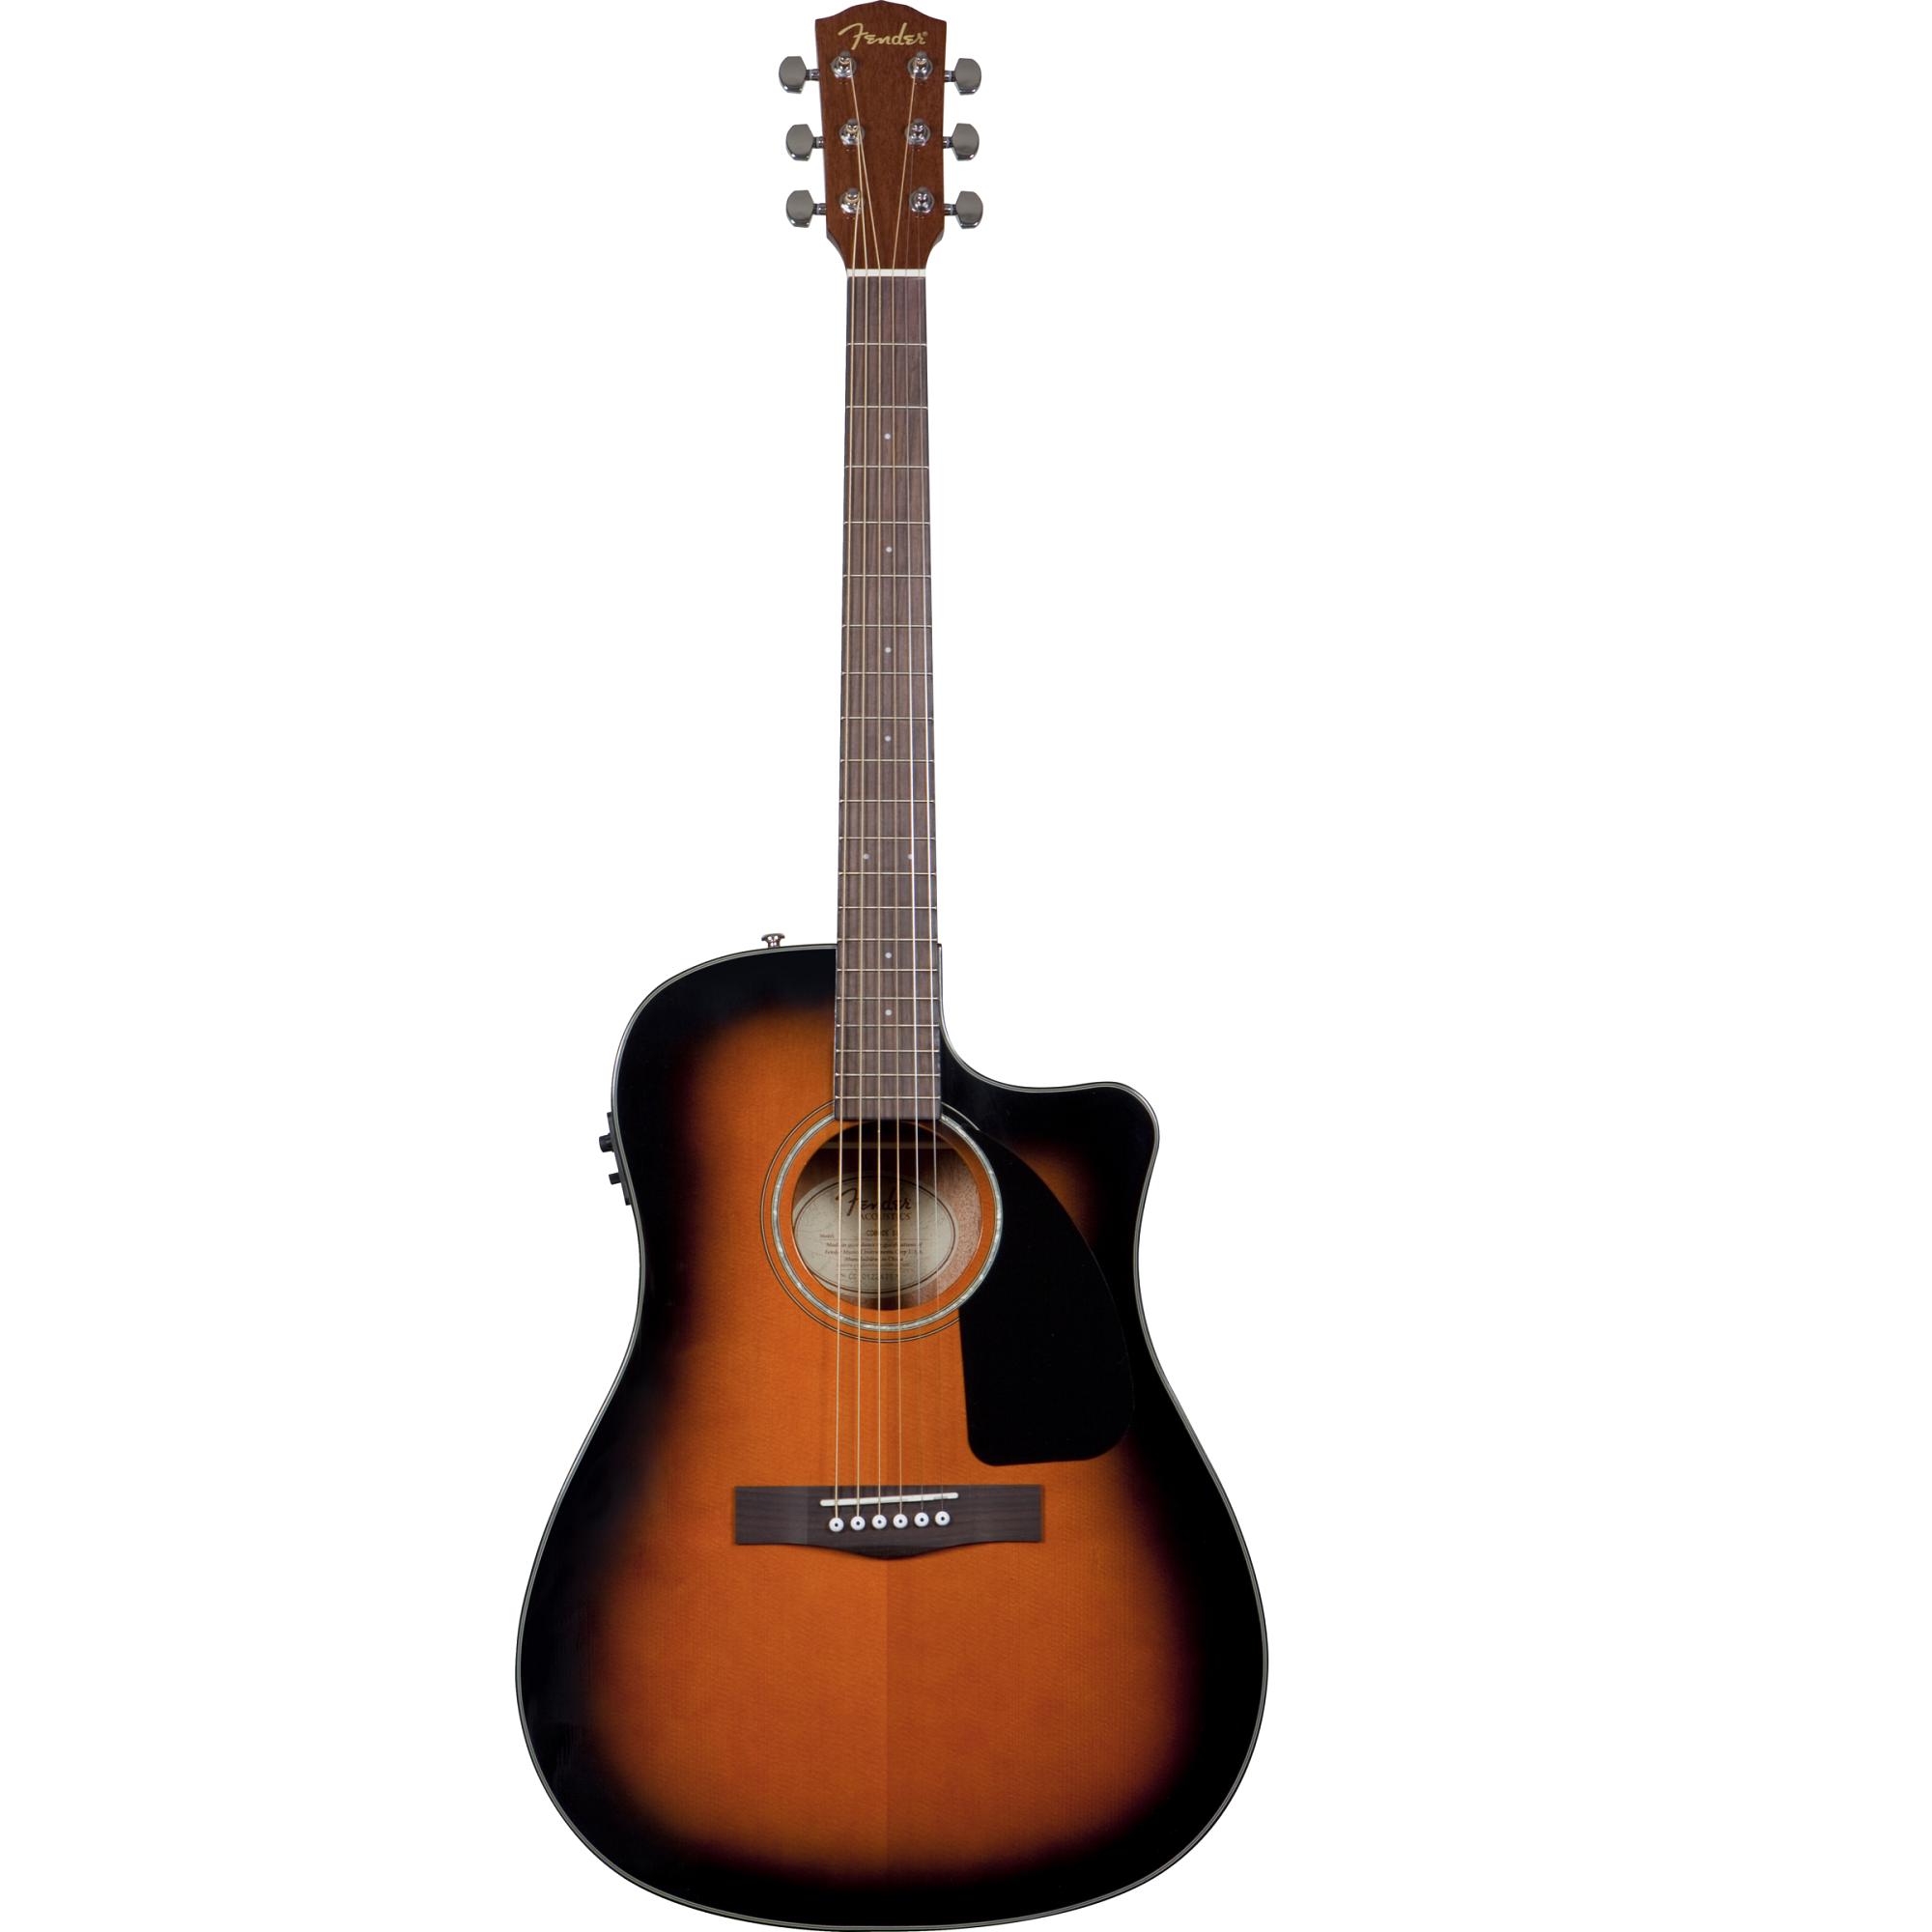 2000x2000 Fender Cd 60 Acousticelectric Guitar Sun Burst Spectra Music